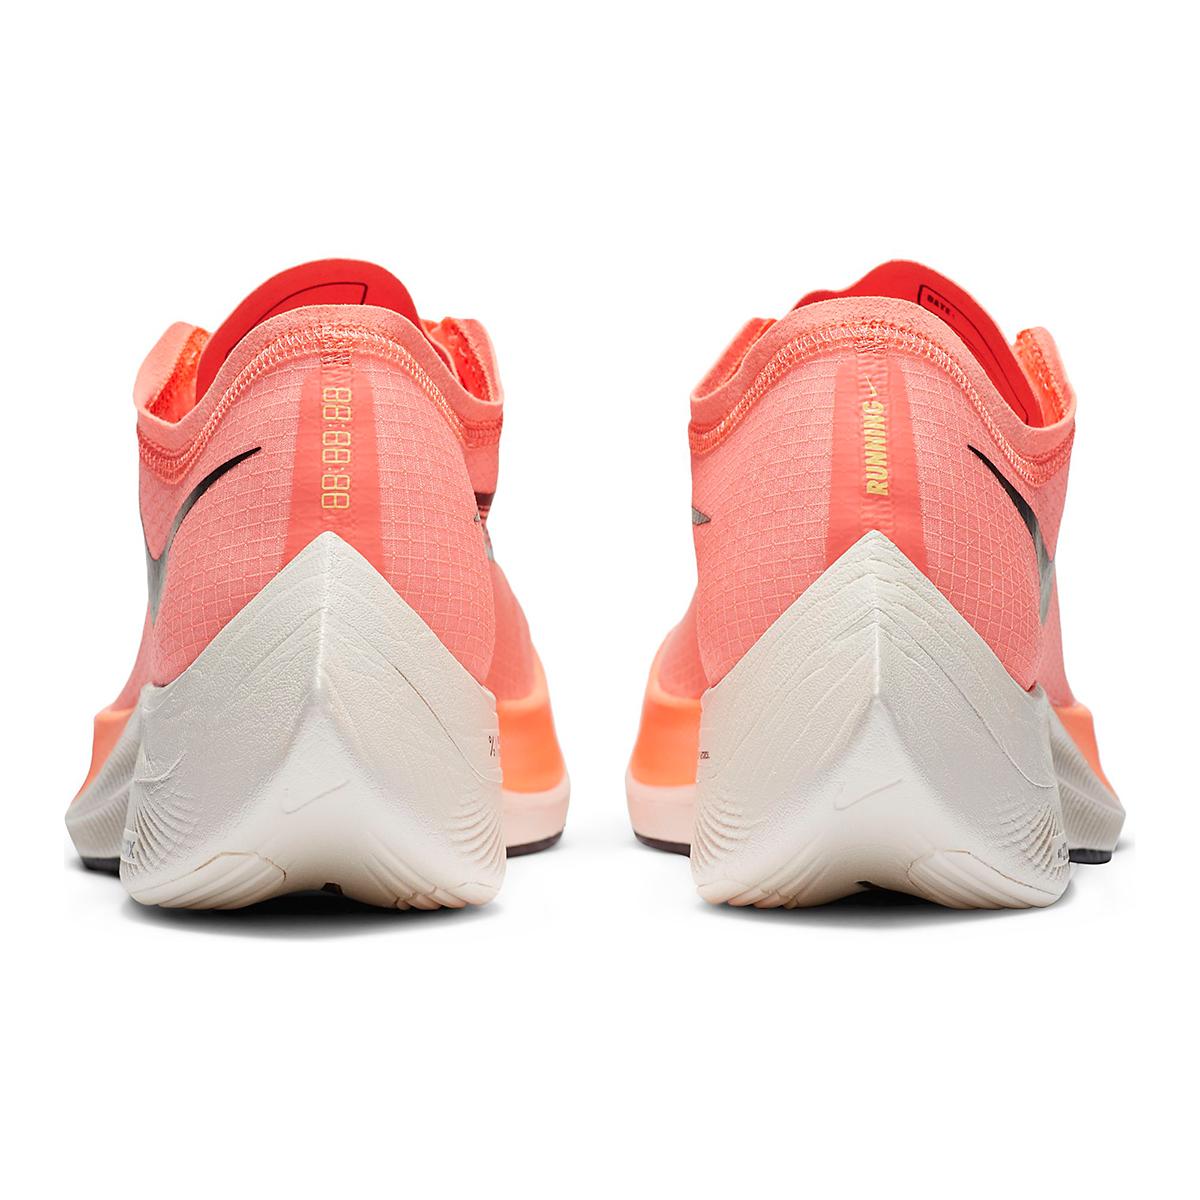 Nike ZoomX Vaporfly NEXT% Running Shoe - Color: Bright Mango/Citron Pulse - Size: M3.5/W5 - Width: Regular, Bright Mango/Citron Pulse, large, image 4